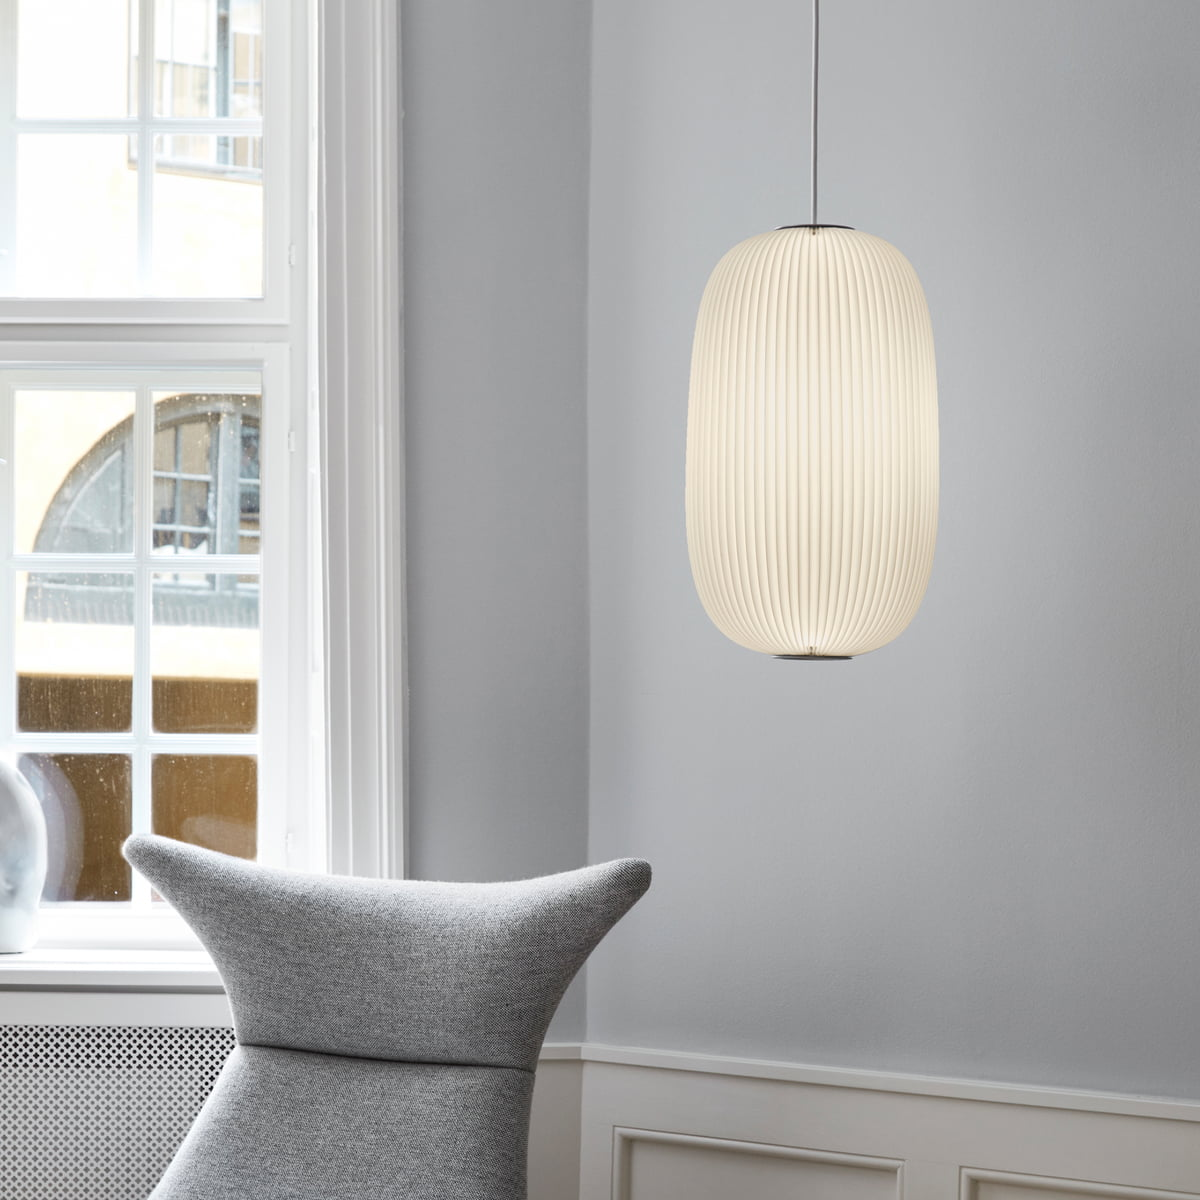 klint lighting wall lamp le klint lamella pendant lamp by connox